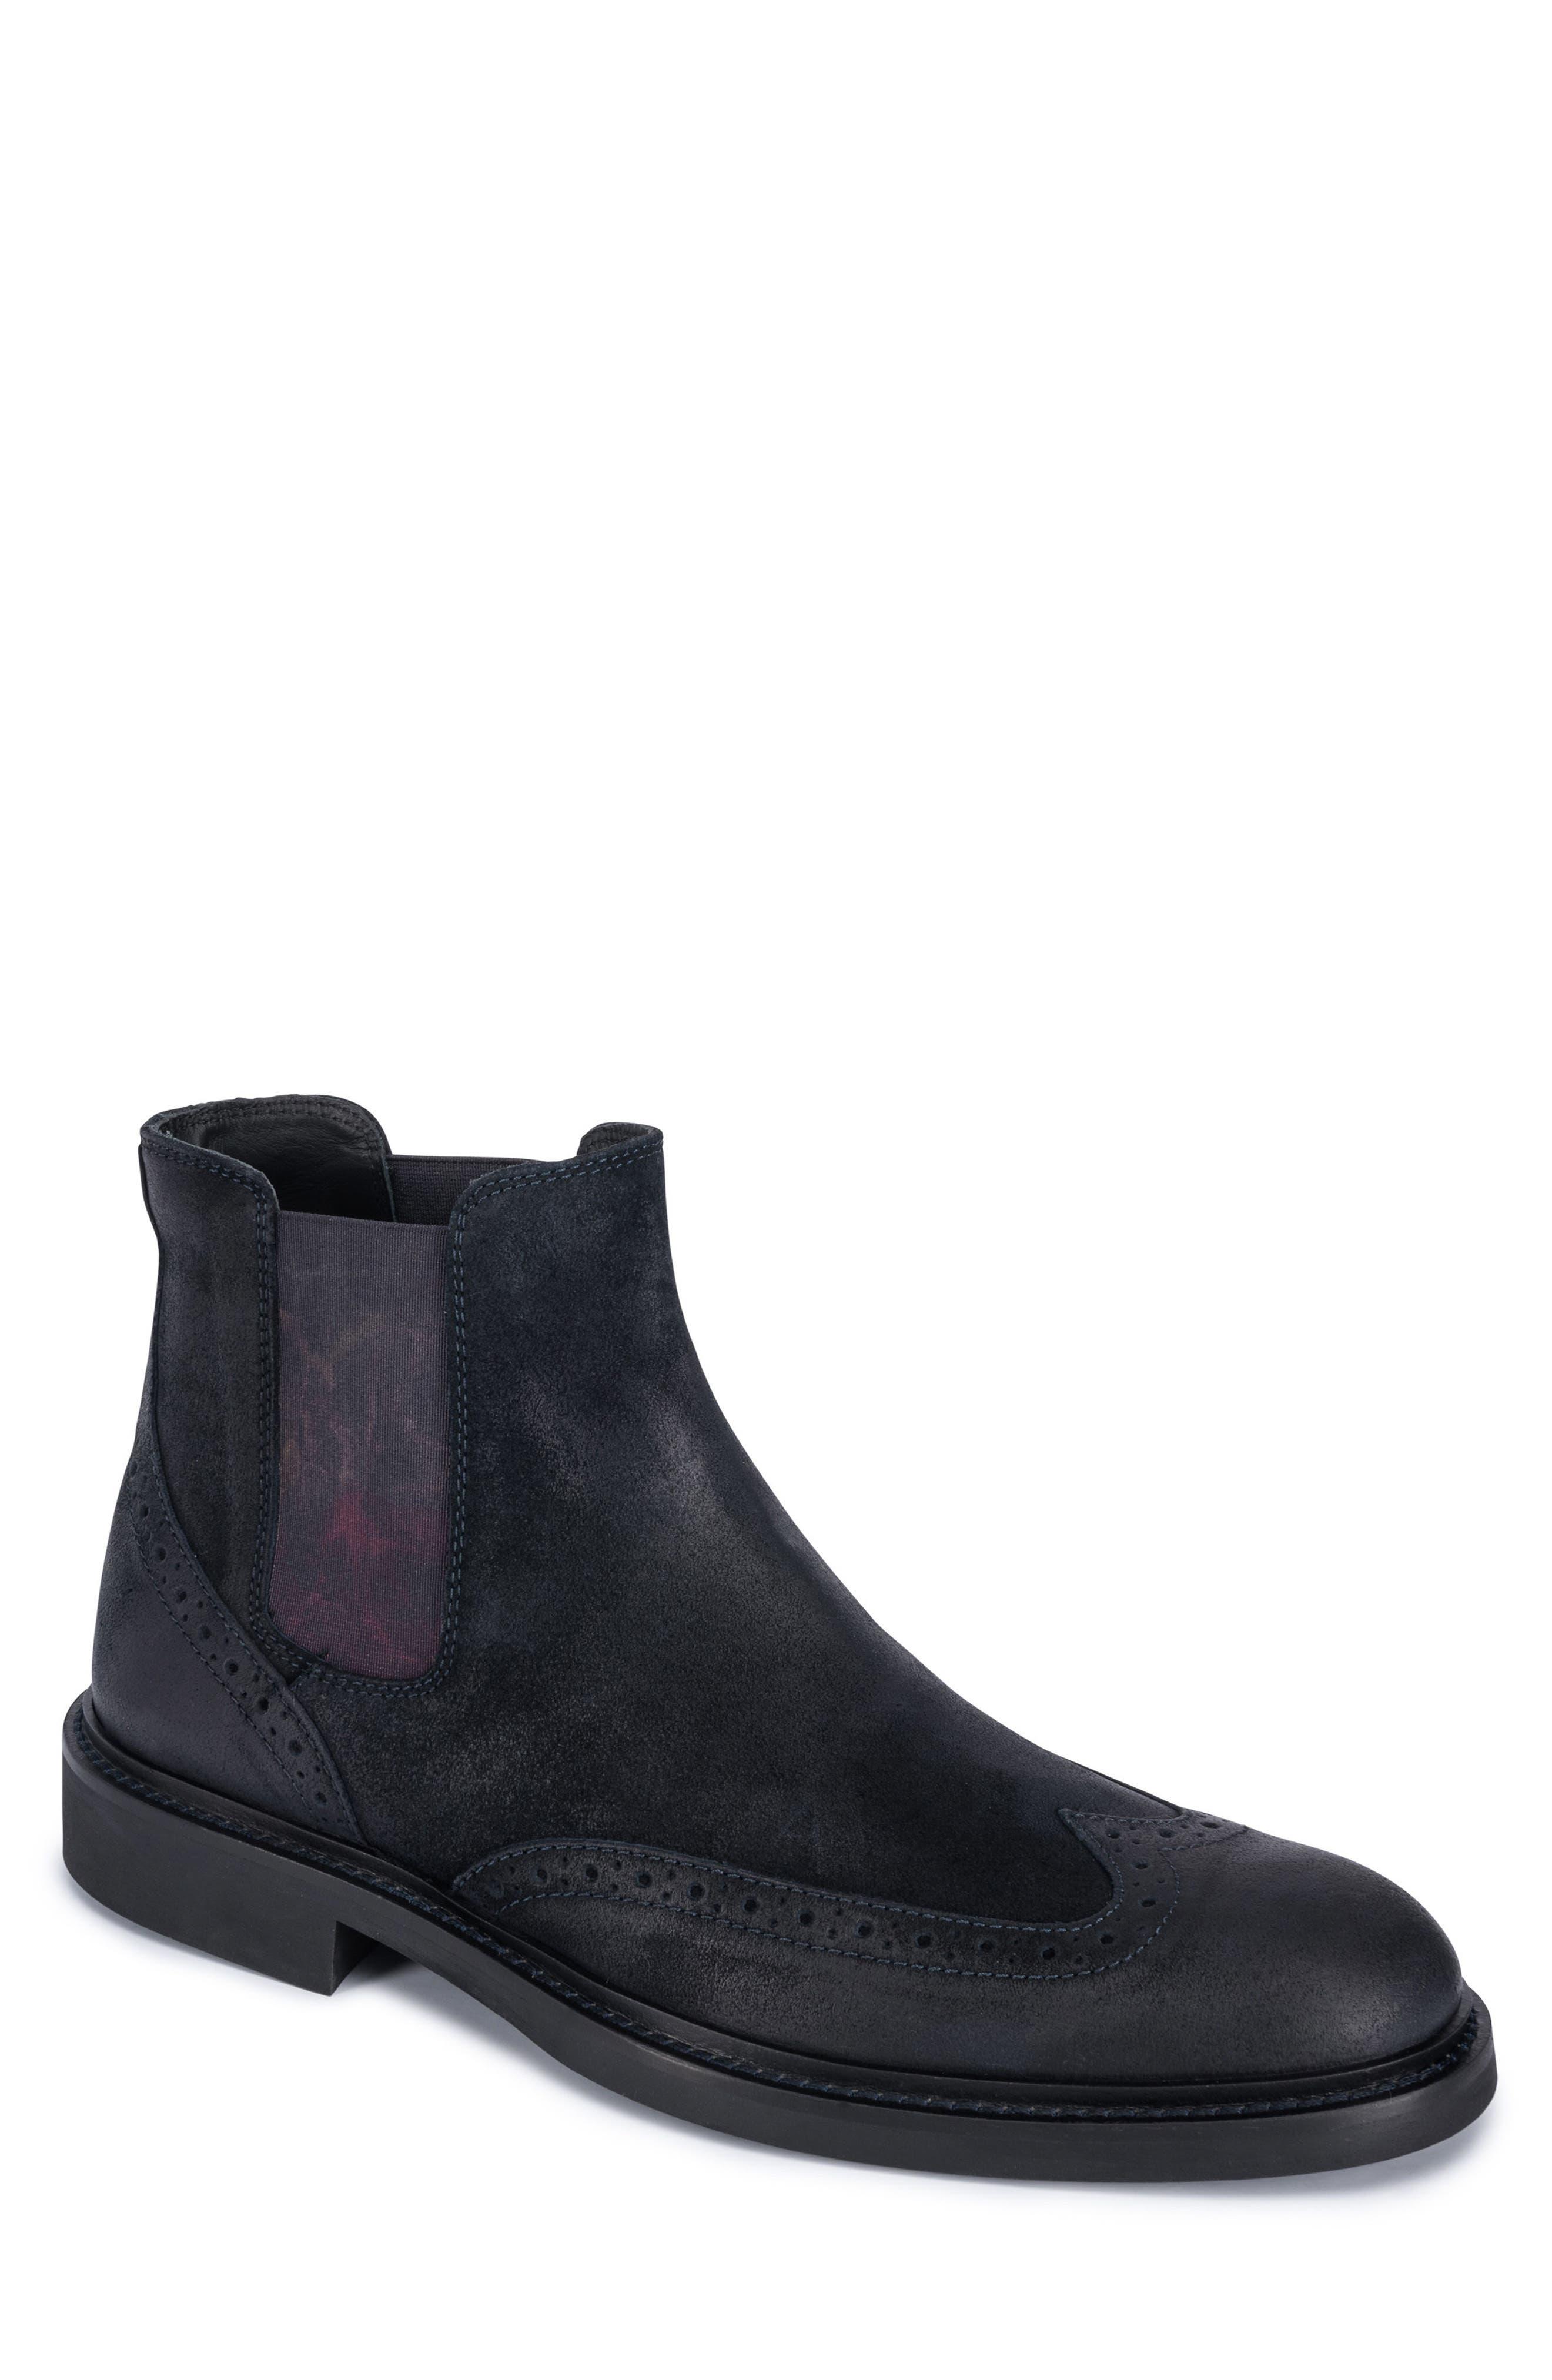 Brescia Chelsea Boot,                         Main,                         color, Navy